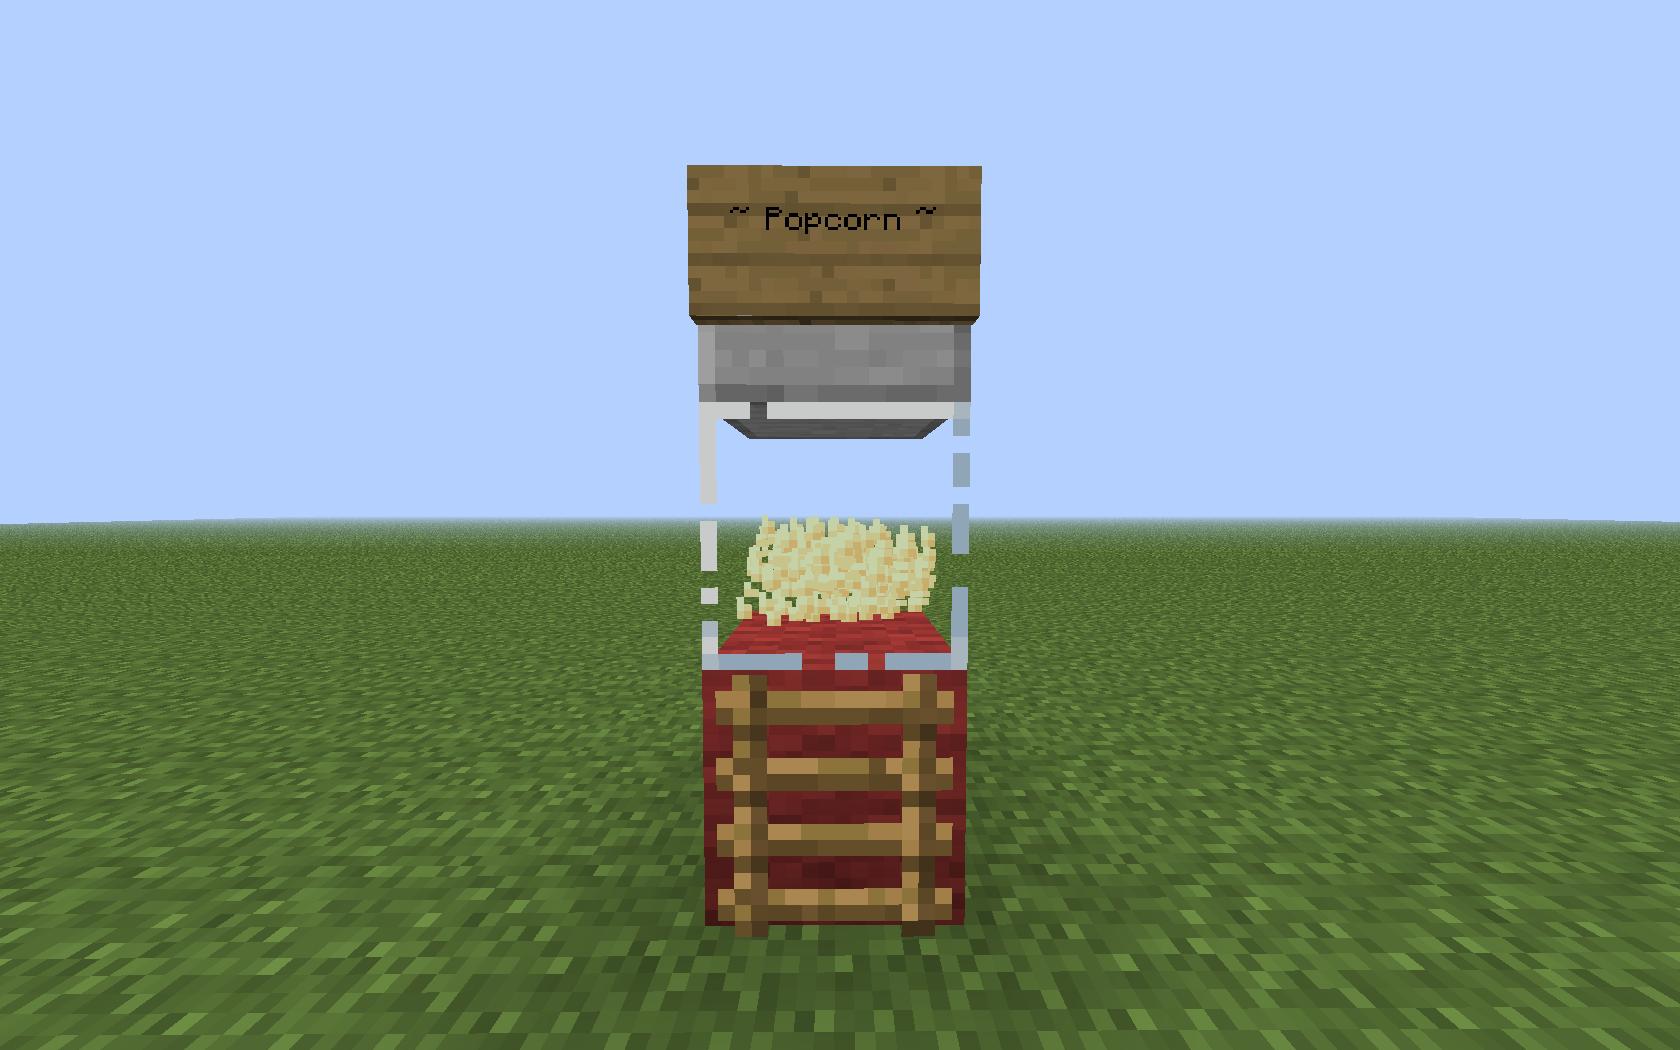 Simple Popcorn Machine   Minecraft   Pinterest   Popcorn ... - photo#22